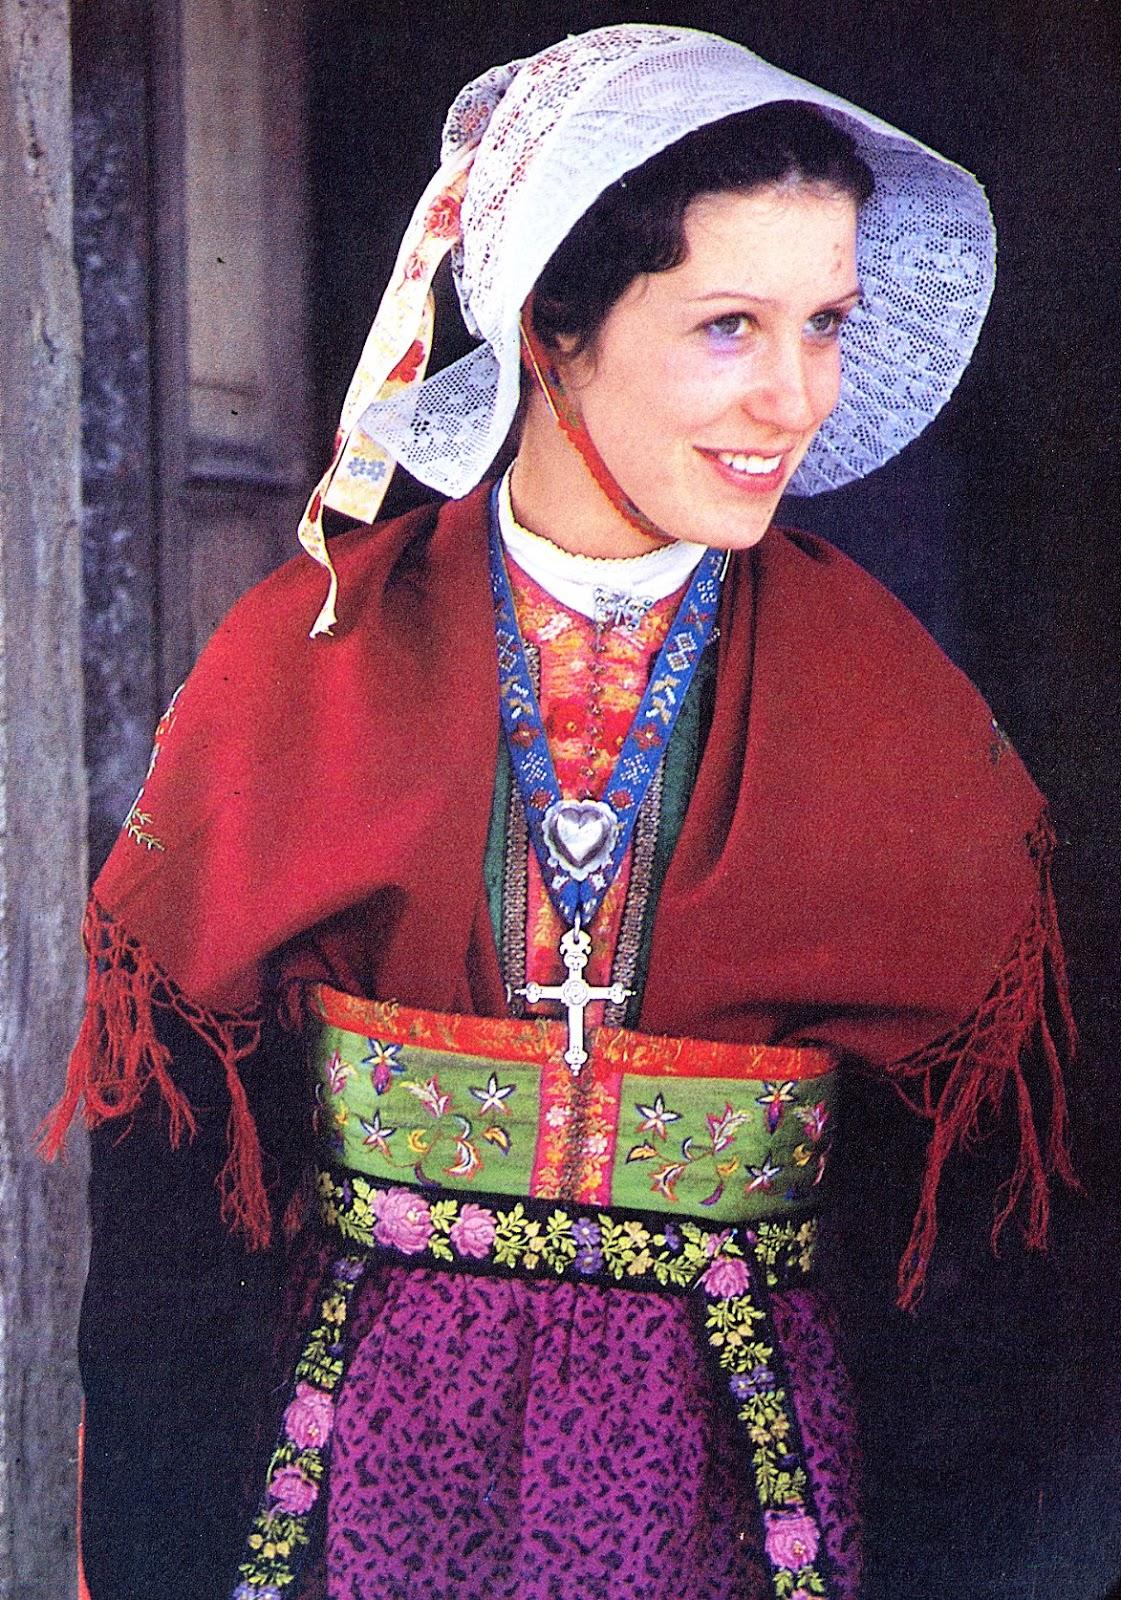 FolkCostume&Embroidery: Costume of the Arvan valley, Savoy ...